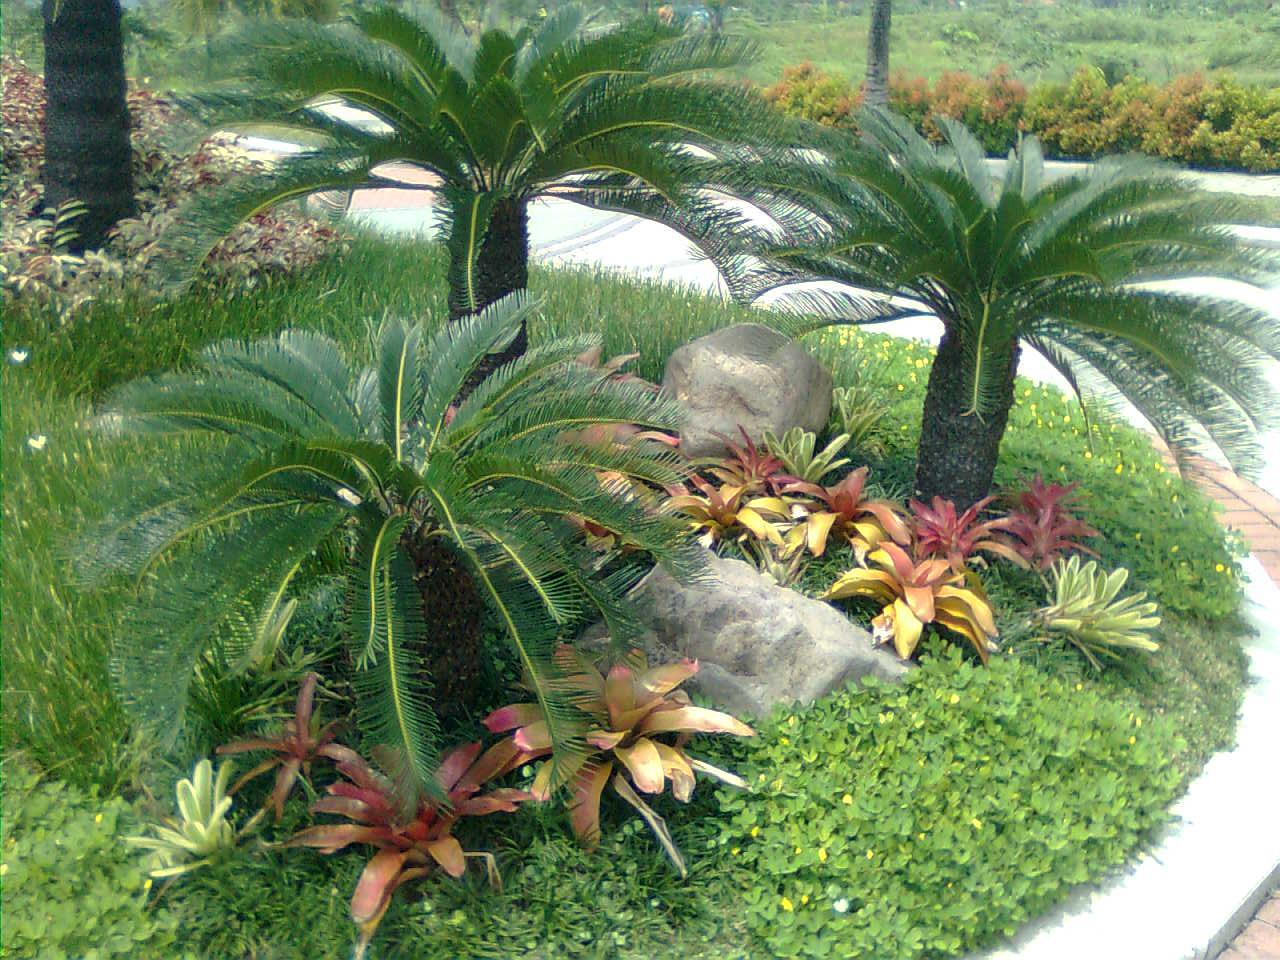 Pohon sikas,jual rumput gajah mini,jual aneka tanaman hias, jual jasa